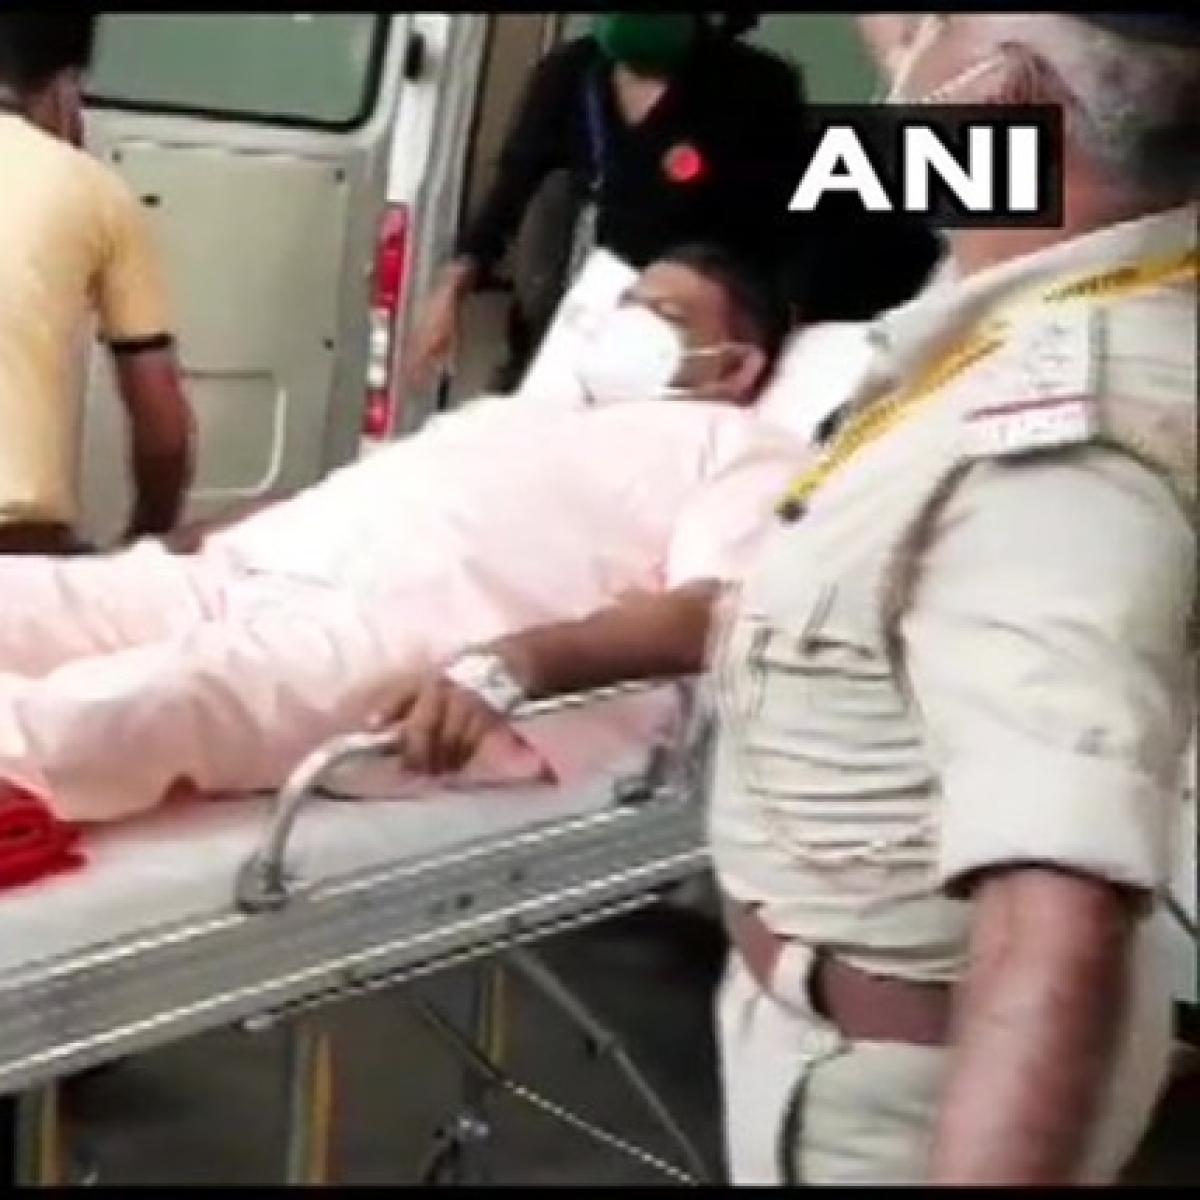 Rajya Sabha Election: BJP MLA Kesarisinh Solanki arrives in ambulance to cast vote in Gujarat